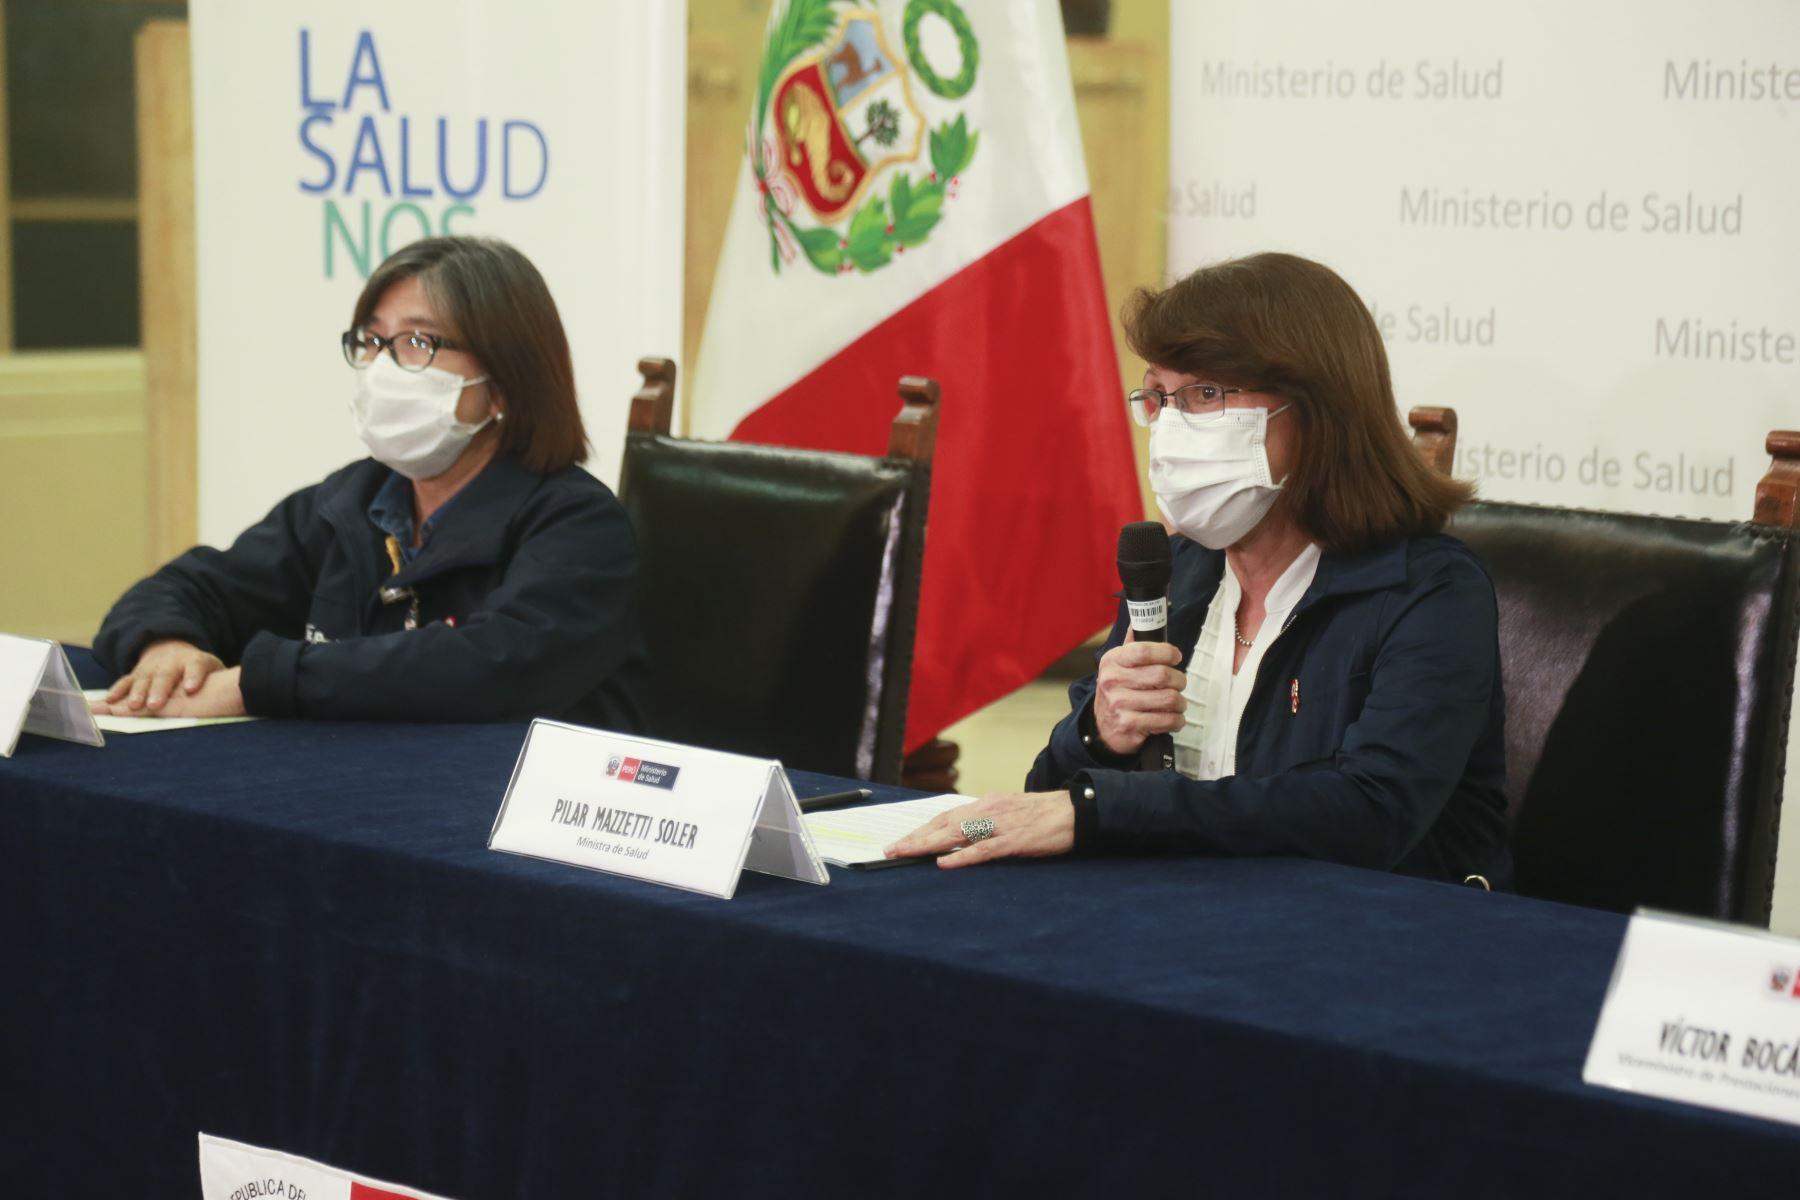 Conferencia de prensa de la ministra de Salud, Pilar Mazzetti. Foto: Minsa